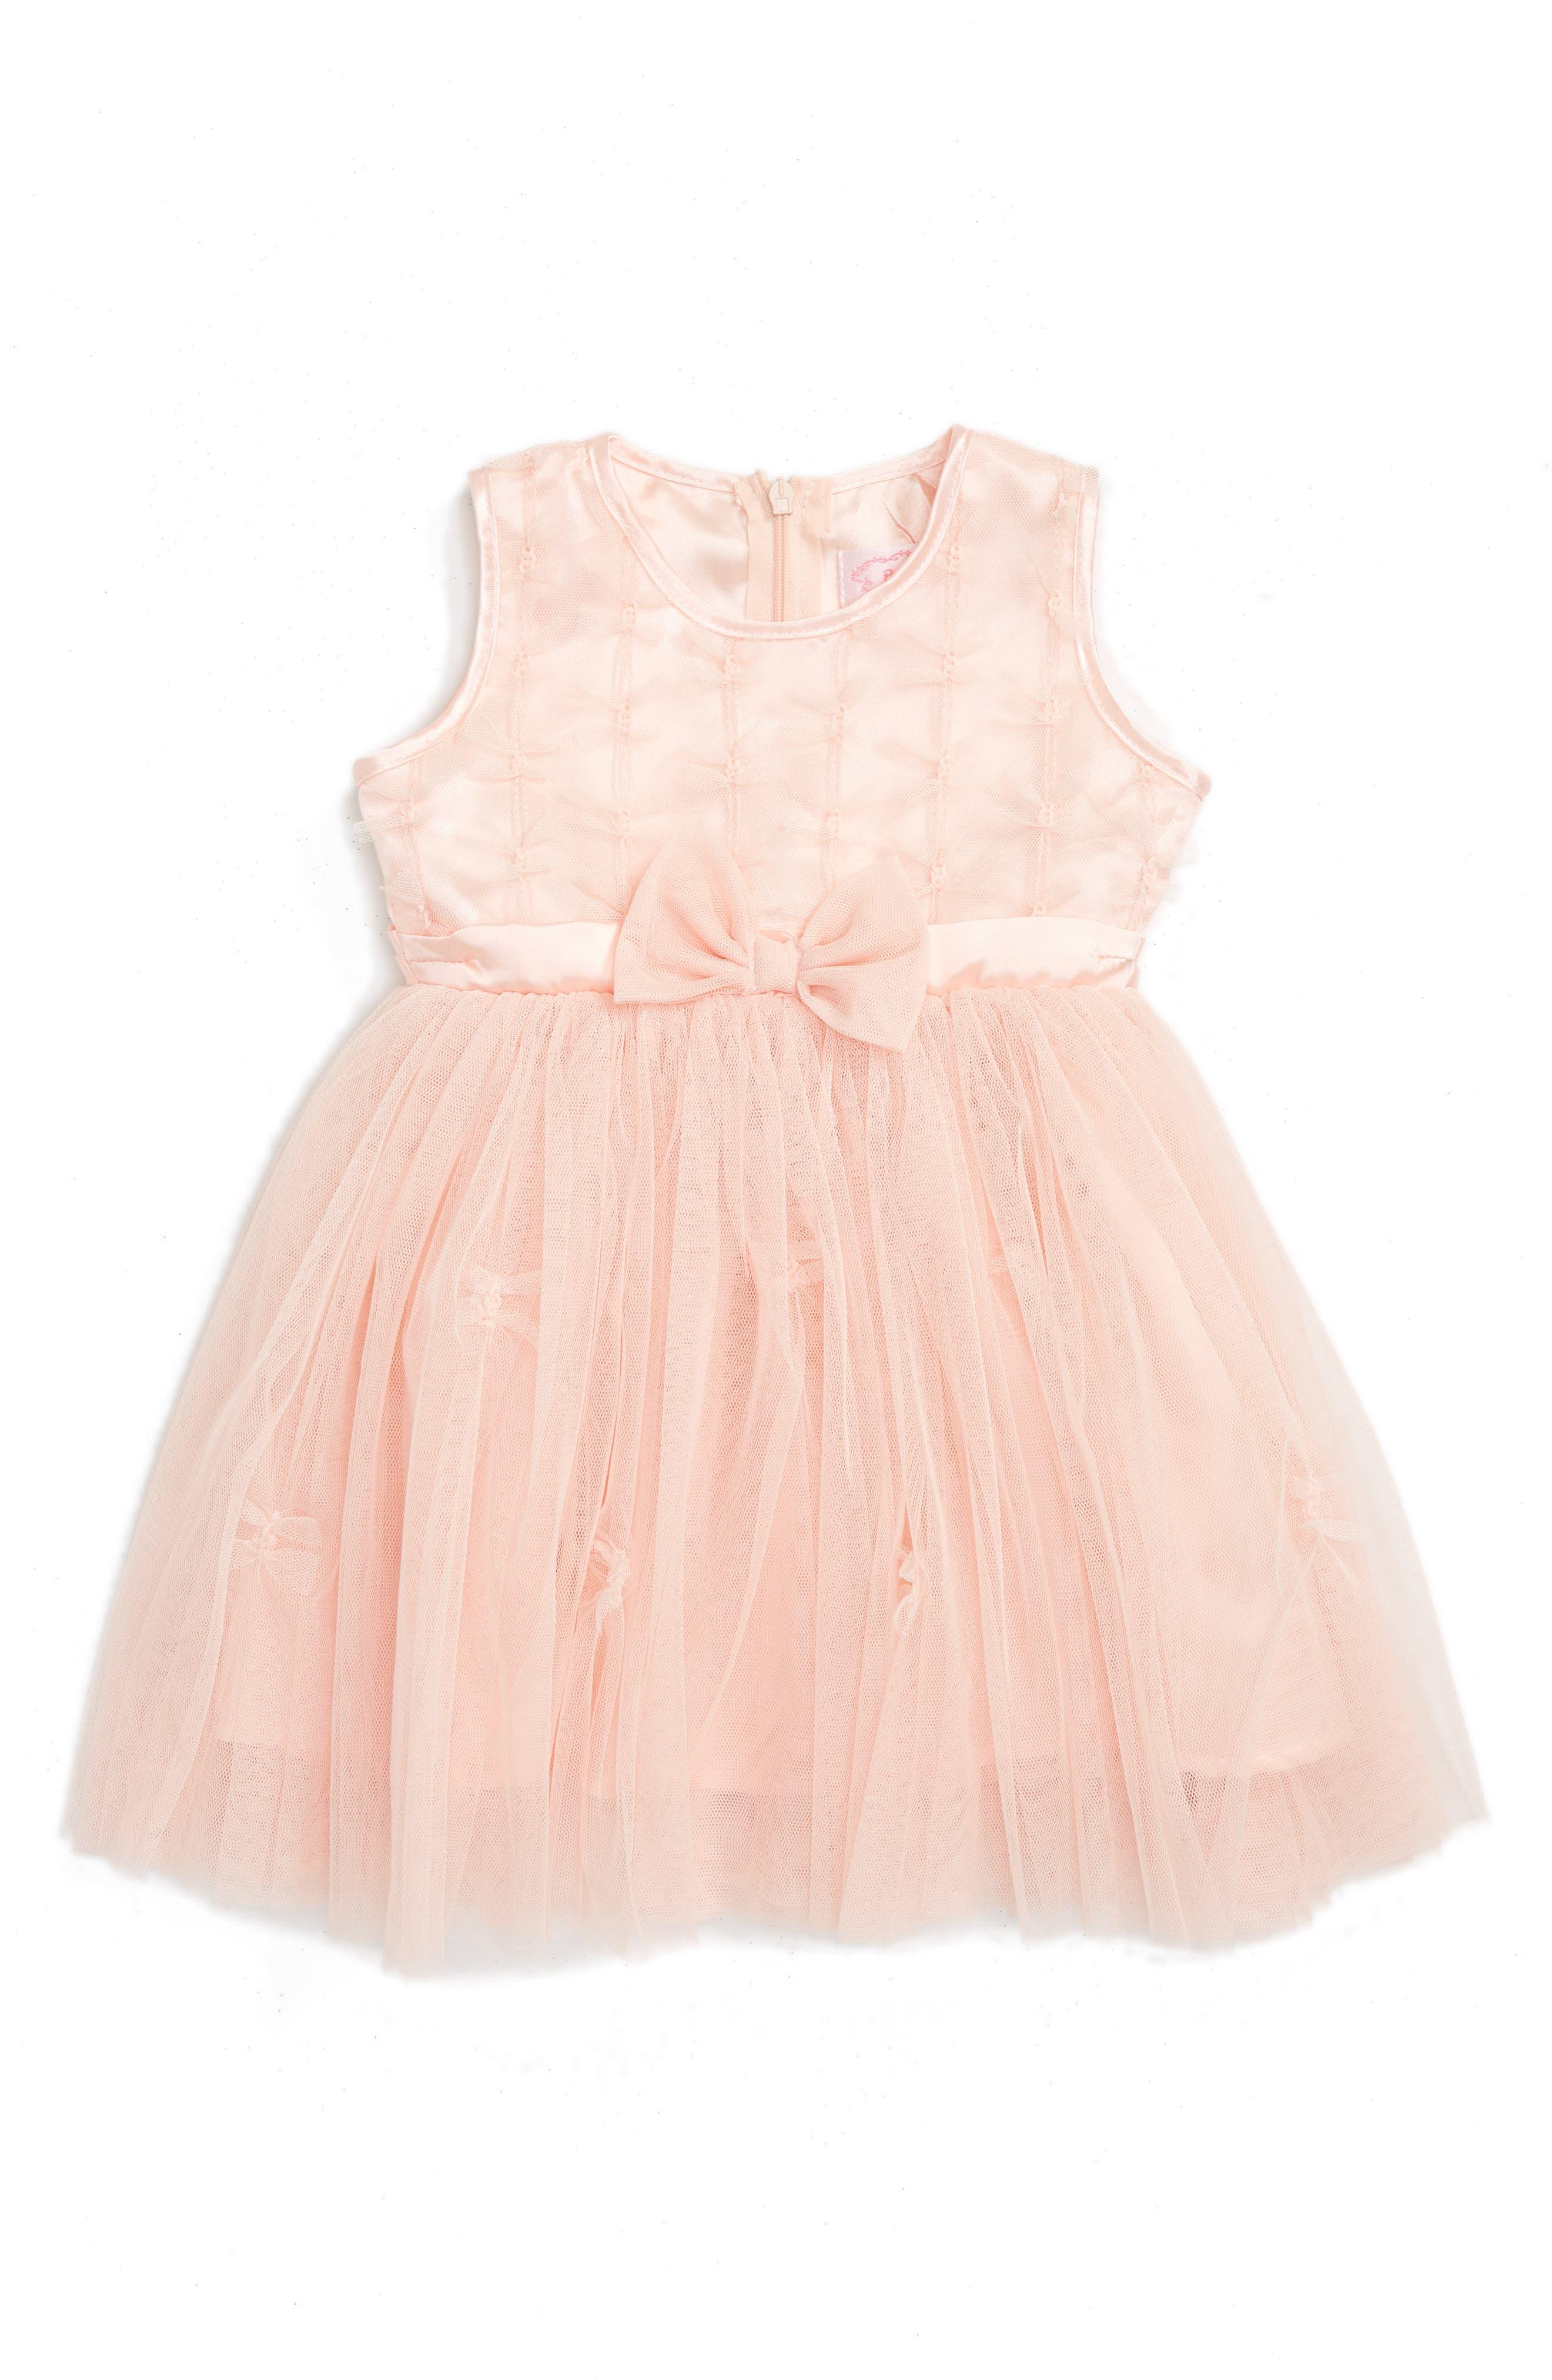 POPATU, Sleeveless Tulle Dress, Main thumbnail 1, color, PEACH